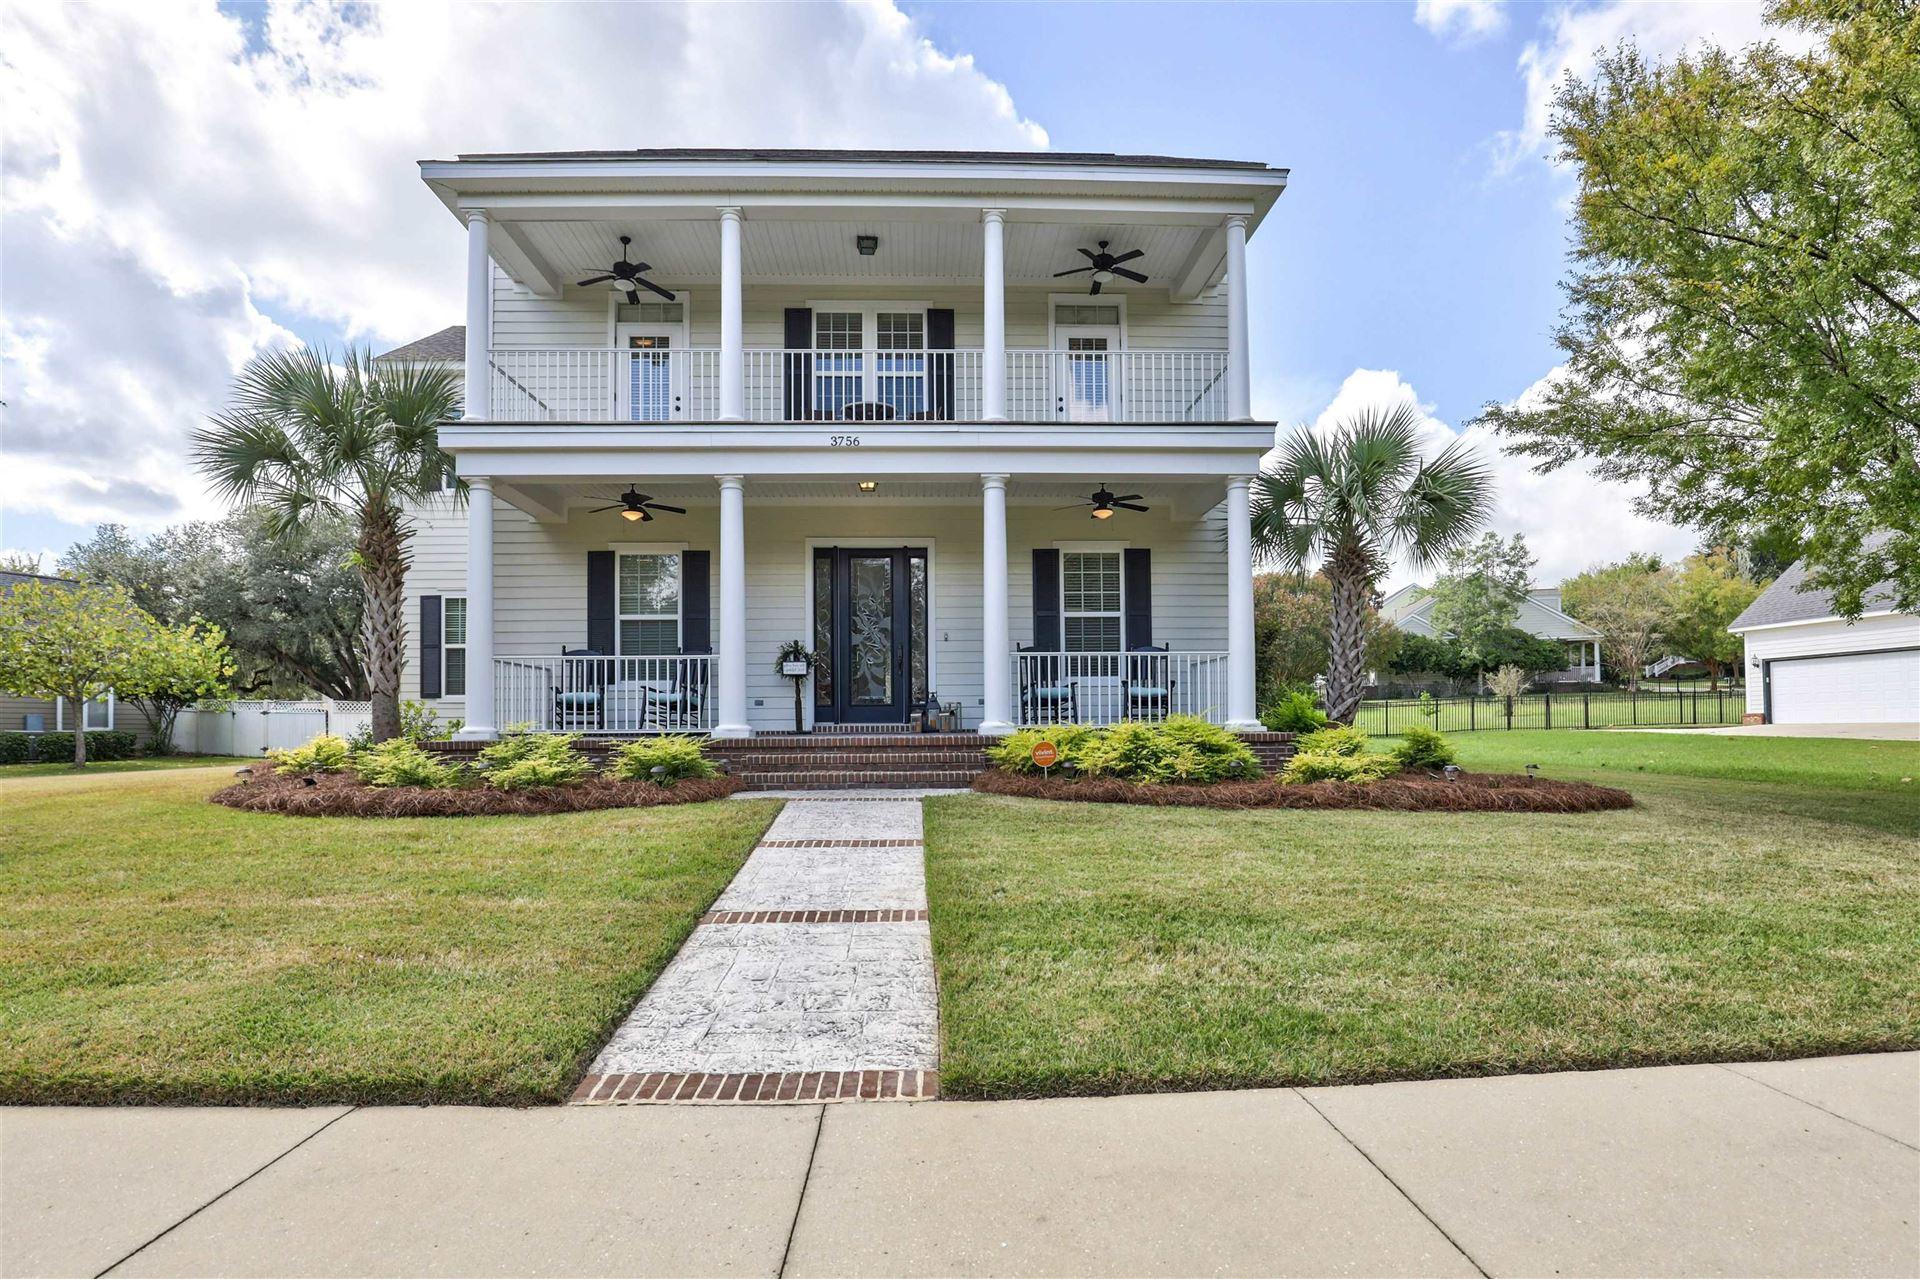 3756 Overlook Drive, Tallahassee, FL 32311 - MLS#: 338607